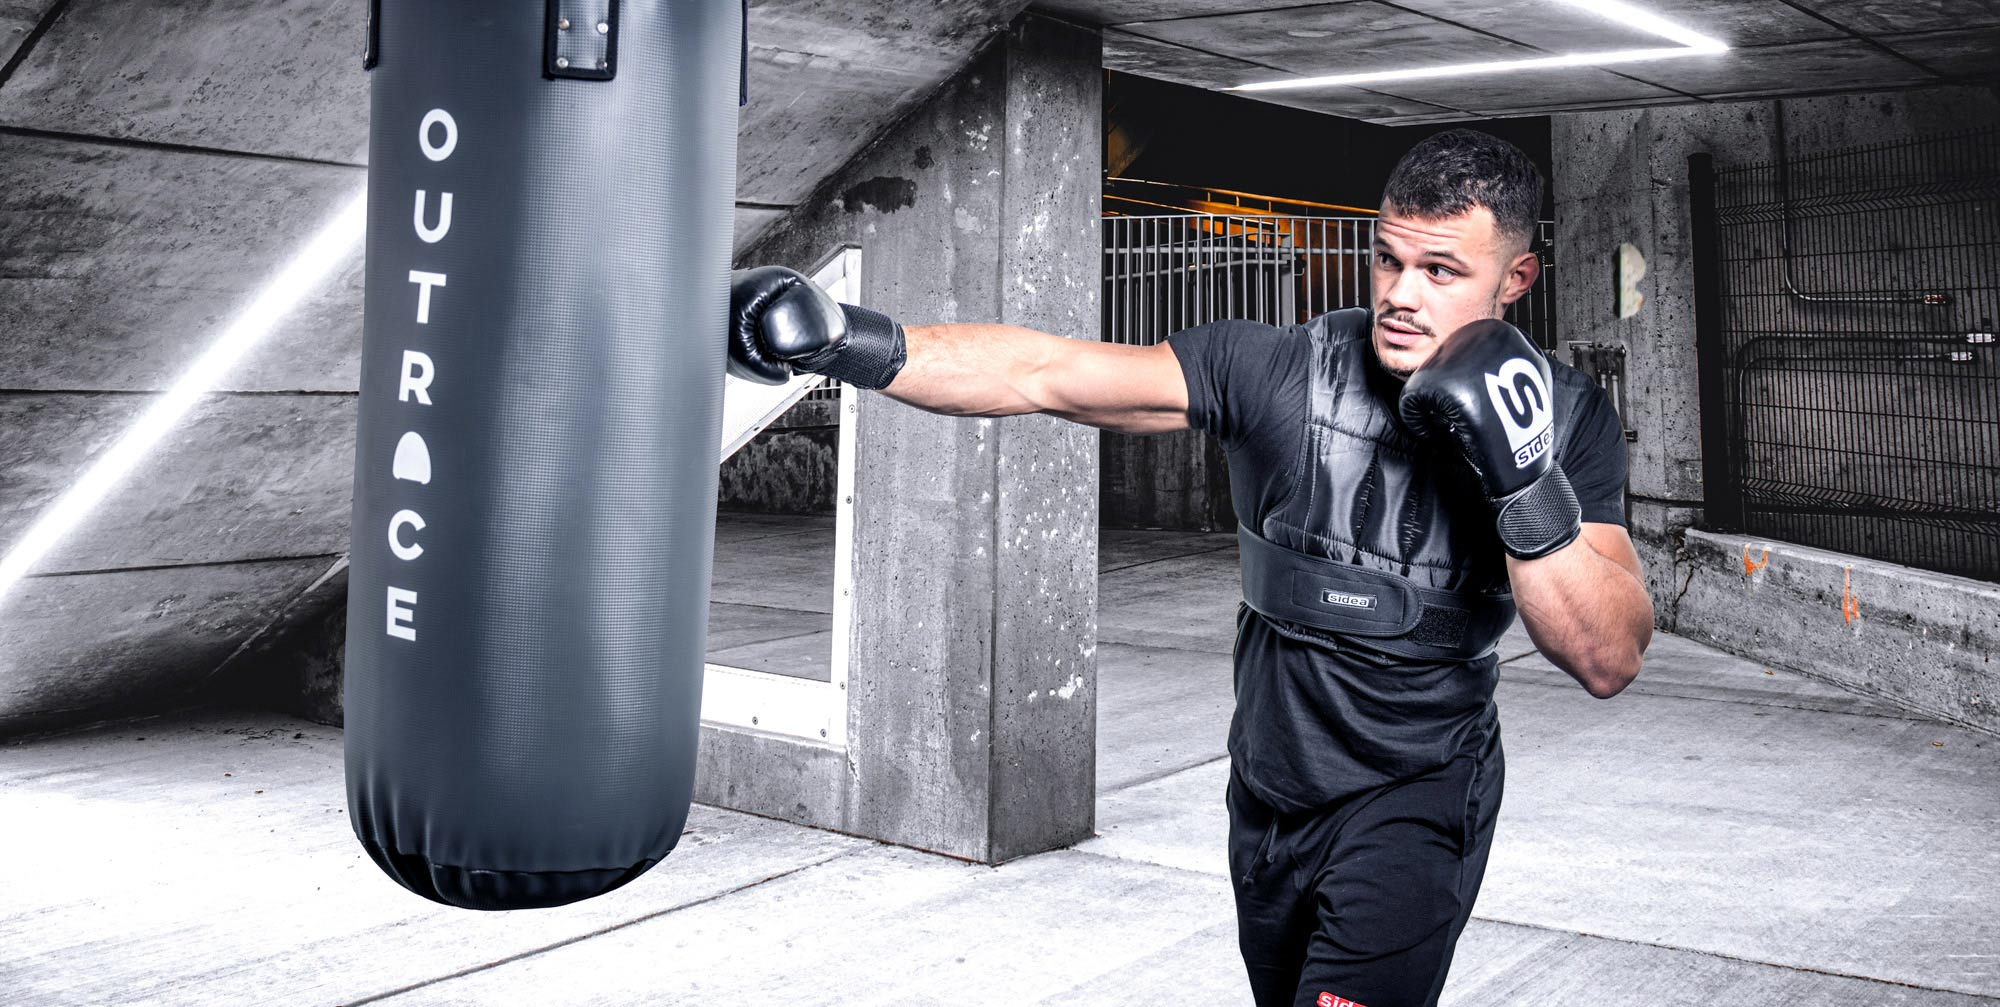 weighted-vest-5-kg-jacket-ballast-weights-gel-weight-overload-sports-practice-training-adjustable-soft